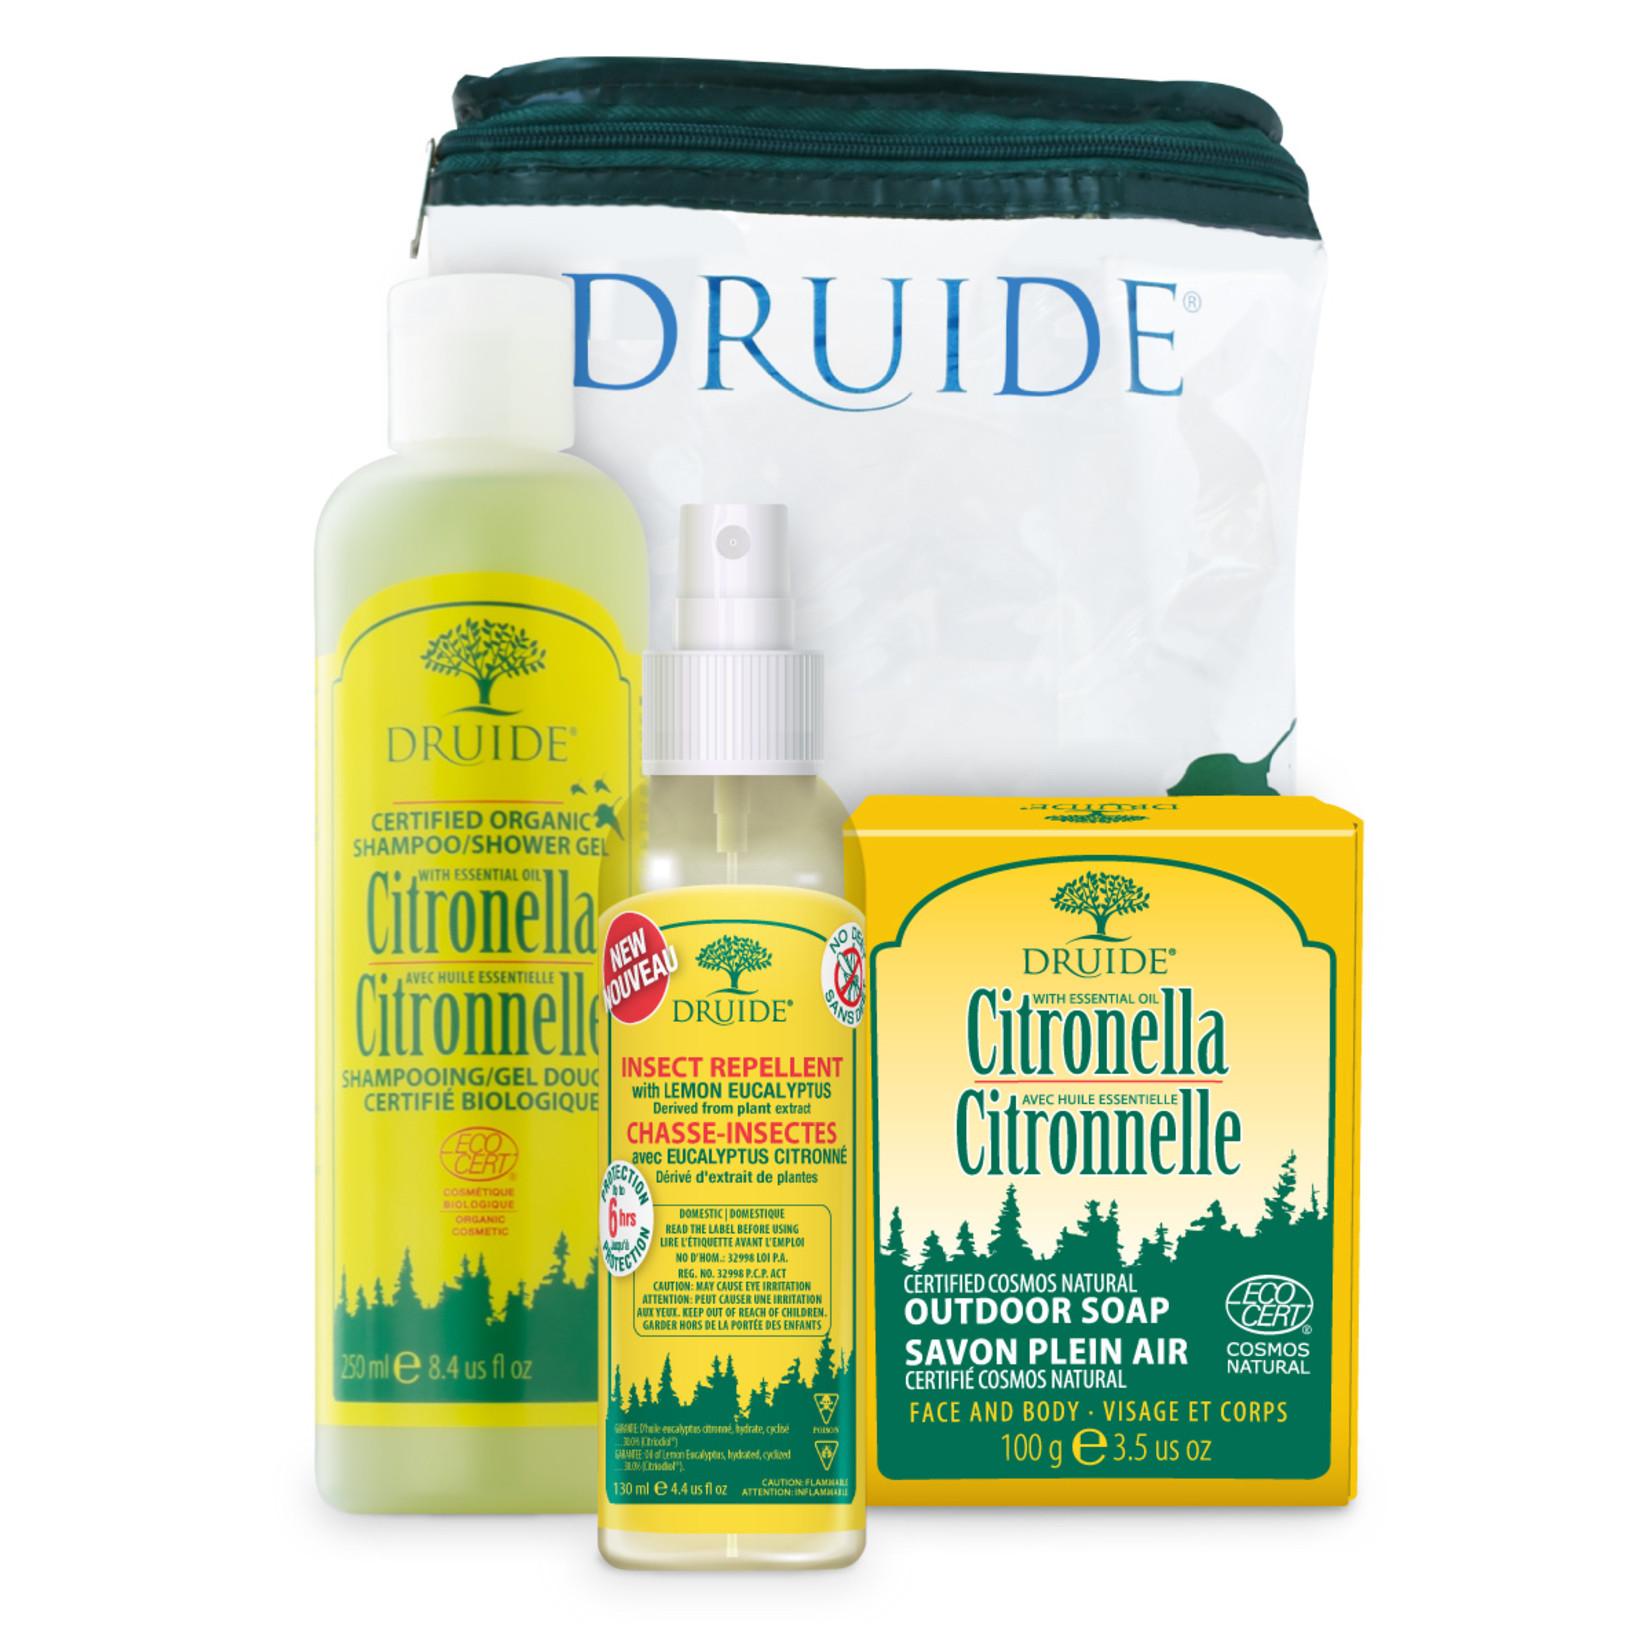 Druide Adventure Kit